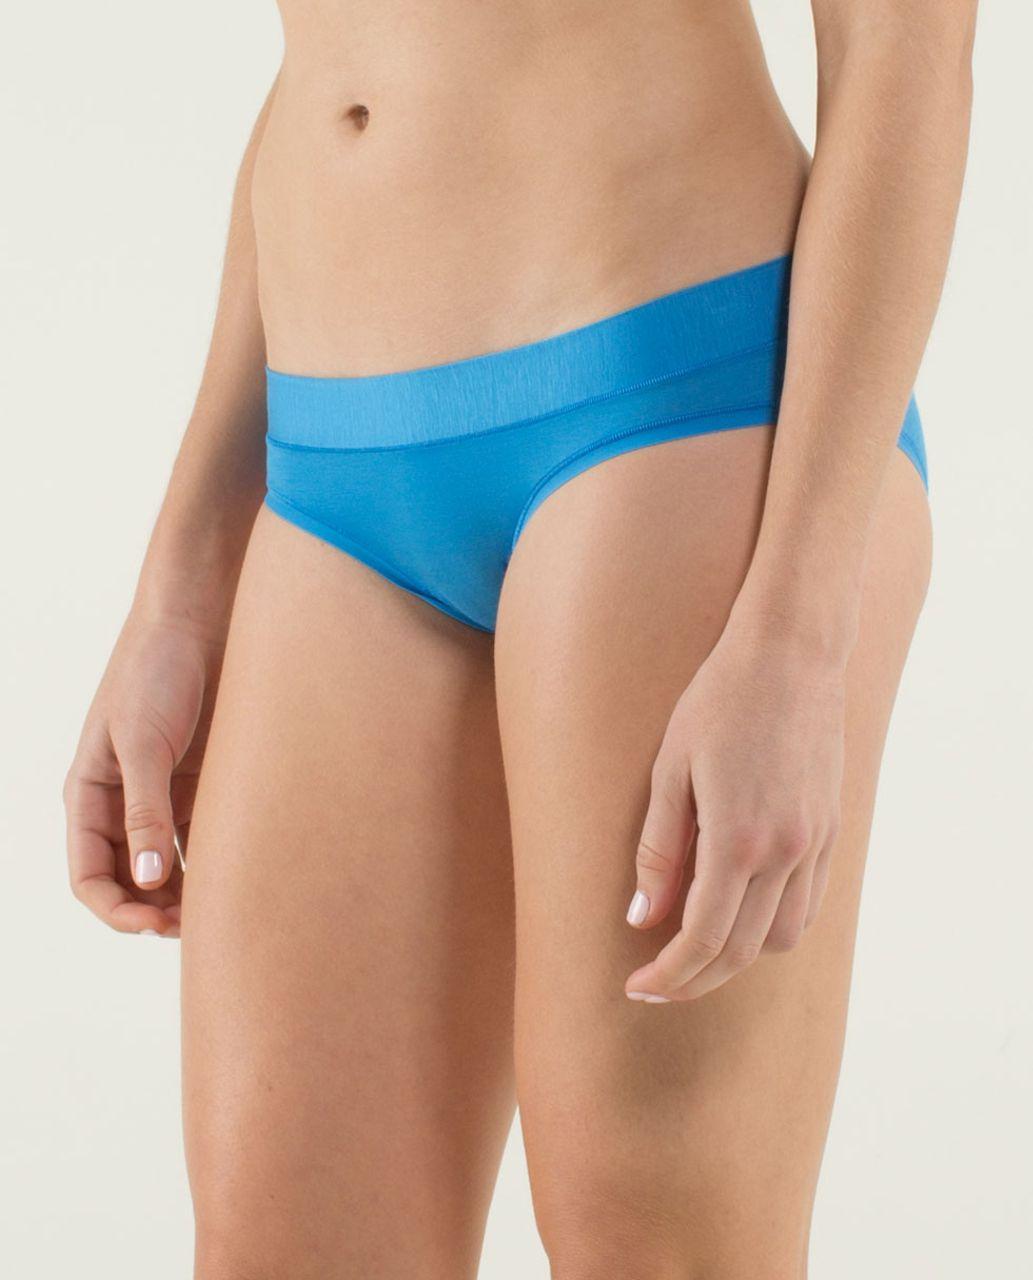 Lululemon Mula Bandhawear Bikini - Cornflower